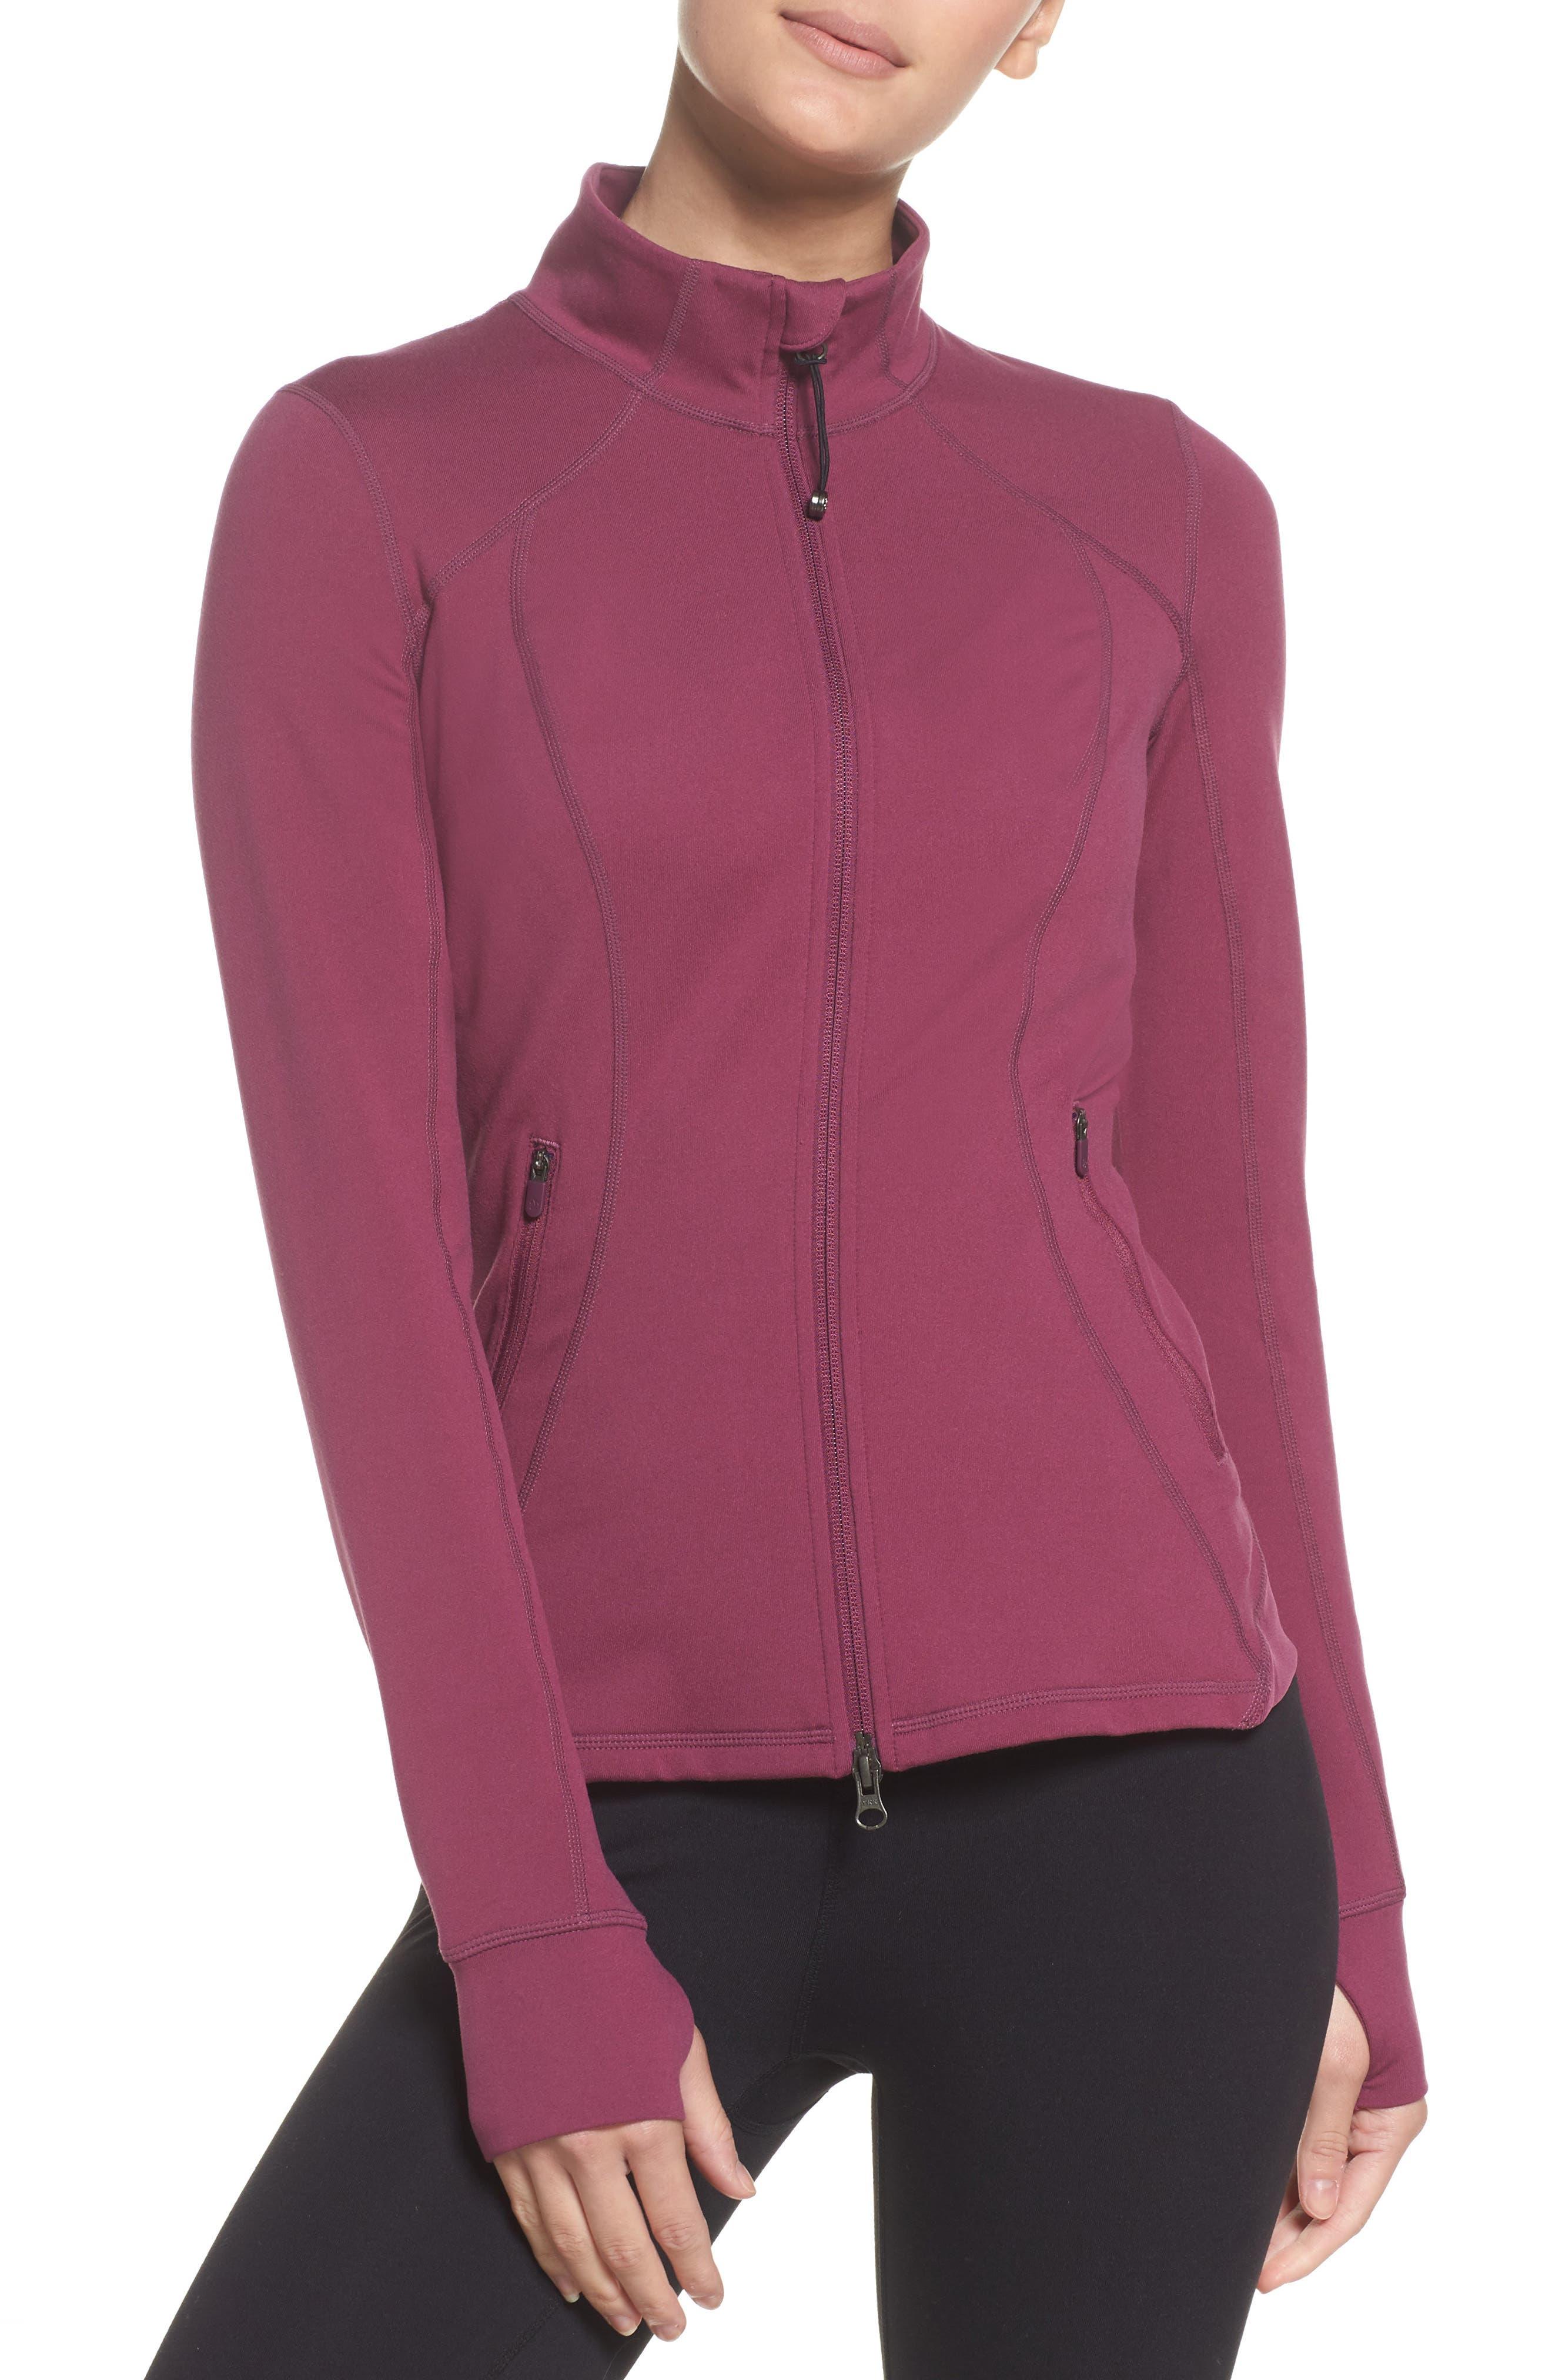 Presence Training Jacket,                         Main,                         color, Purple Cabbage